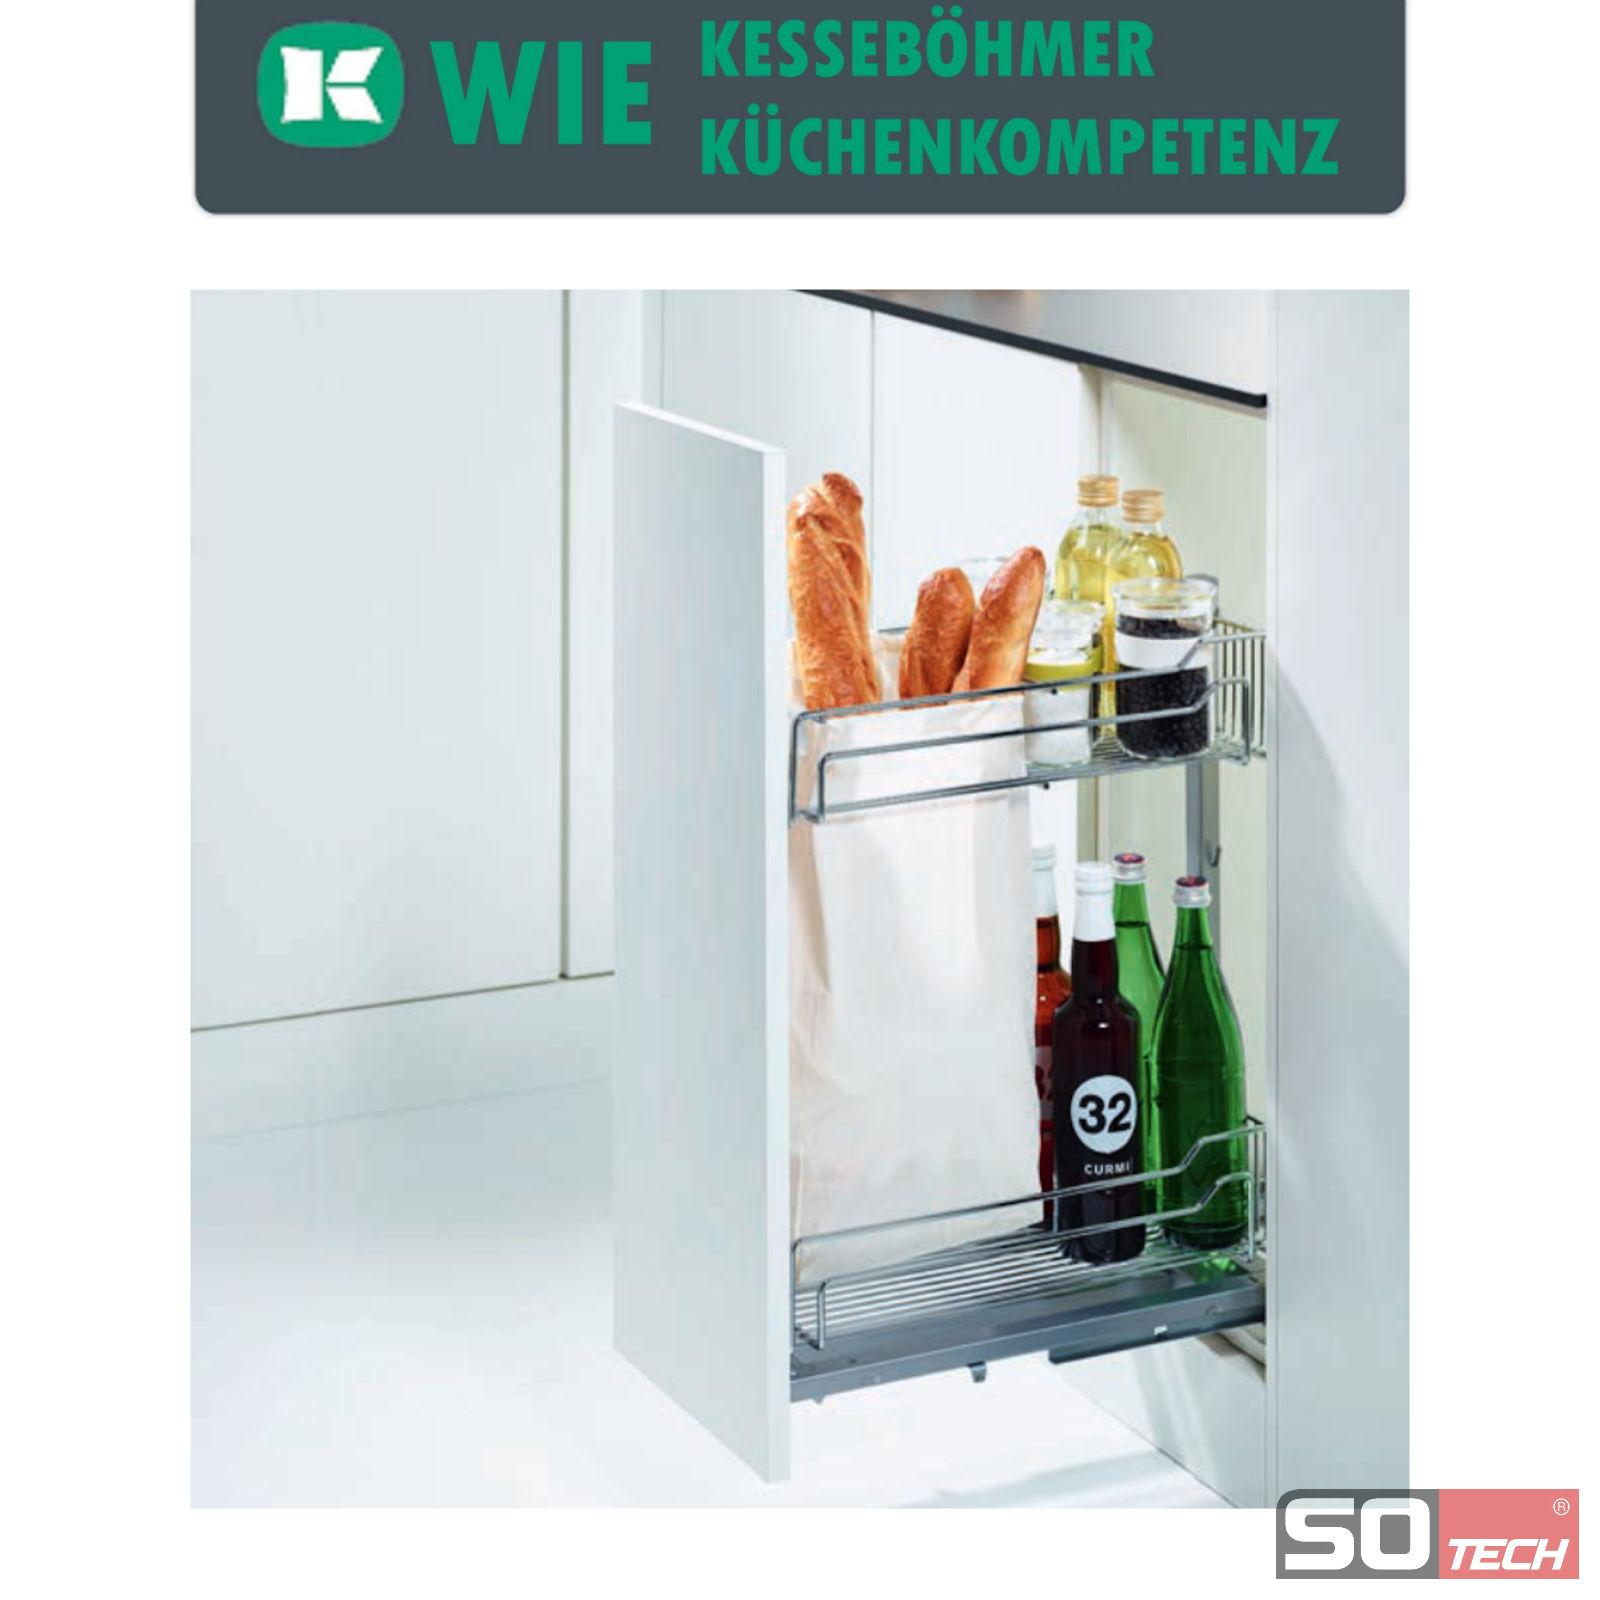 MK49 KOFFER-//LADERAUM HECKKLAPPEND/ÄMPFER F/ÜR COMPASS 2x STABILUS 130257 //// LIFT-O-MAT/® GASFEDER ab BAUJAHR 08.06